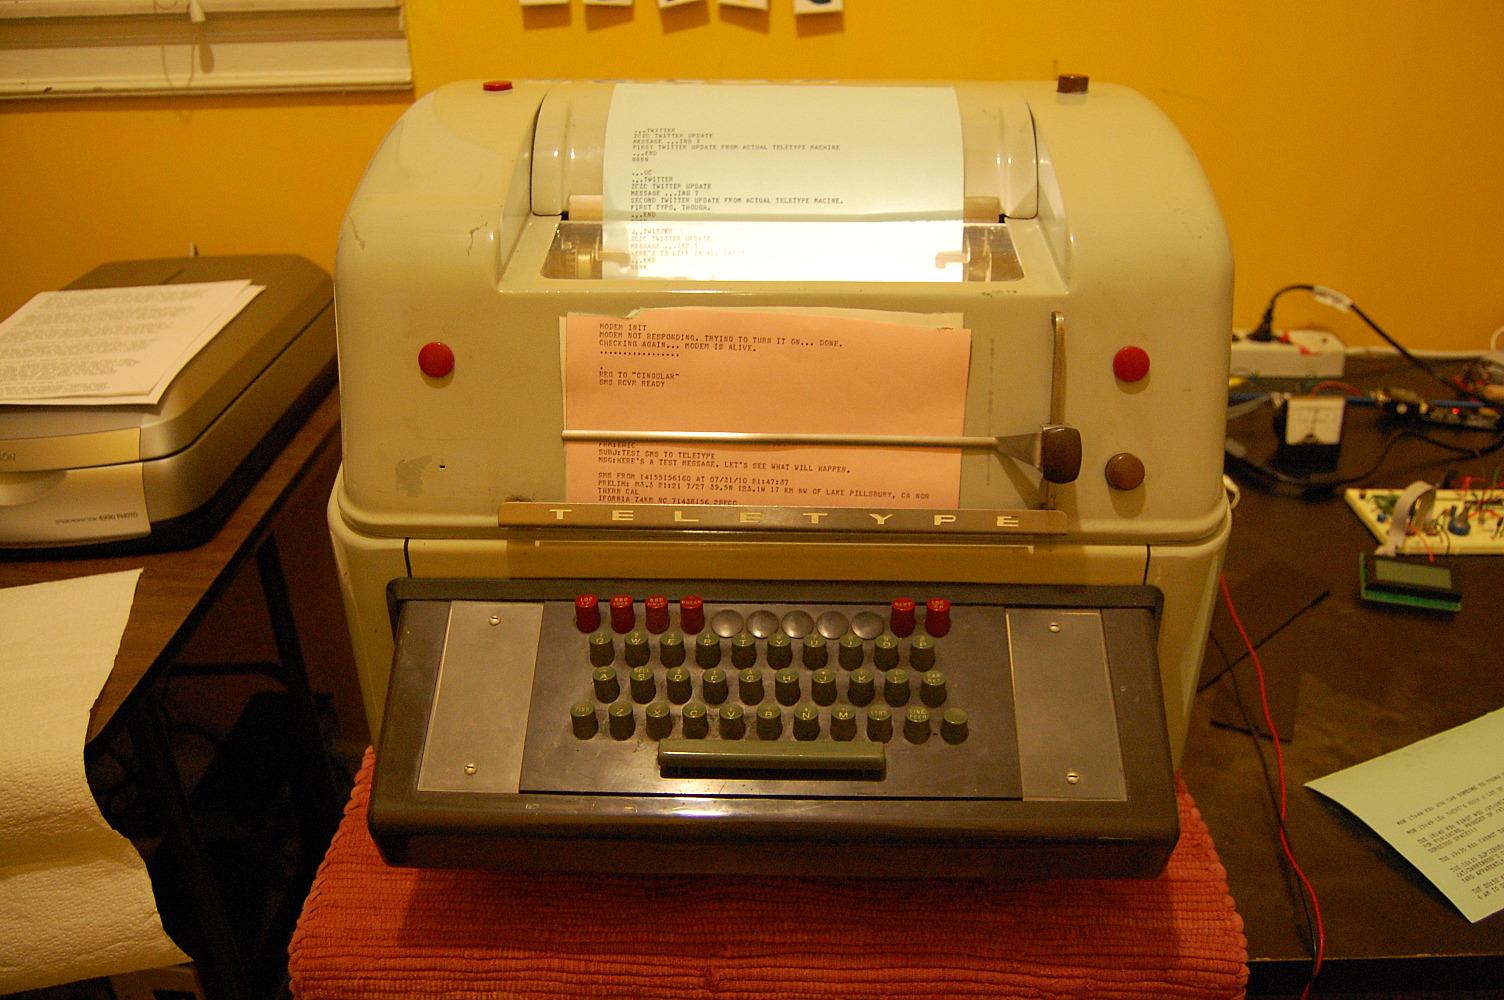 Teletweety - Mechanical Teletype doing Twitter